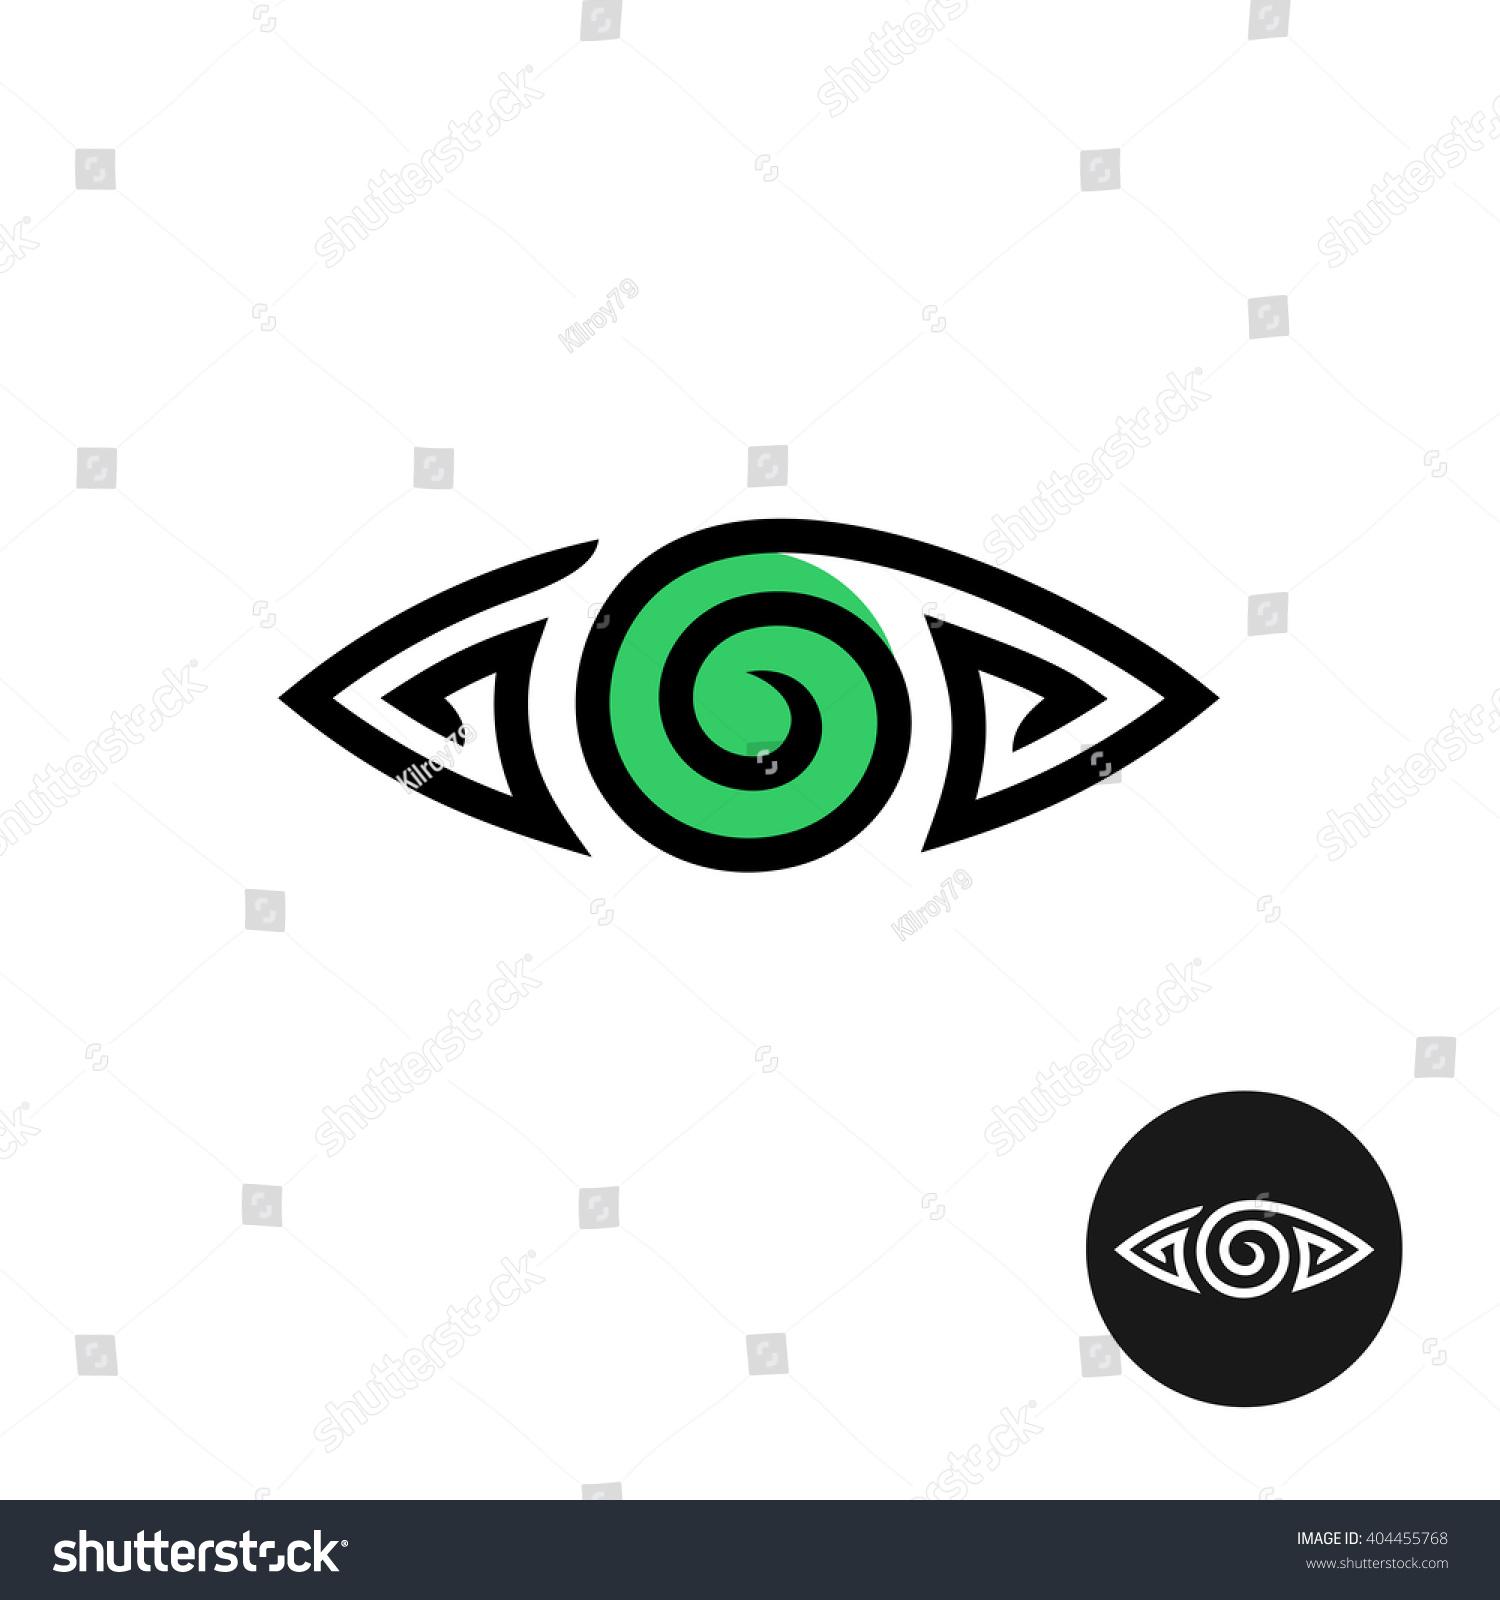 Green Spiral Eye Logo Top Images For Pinterest